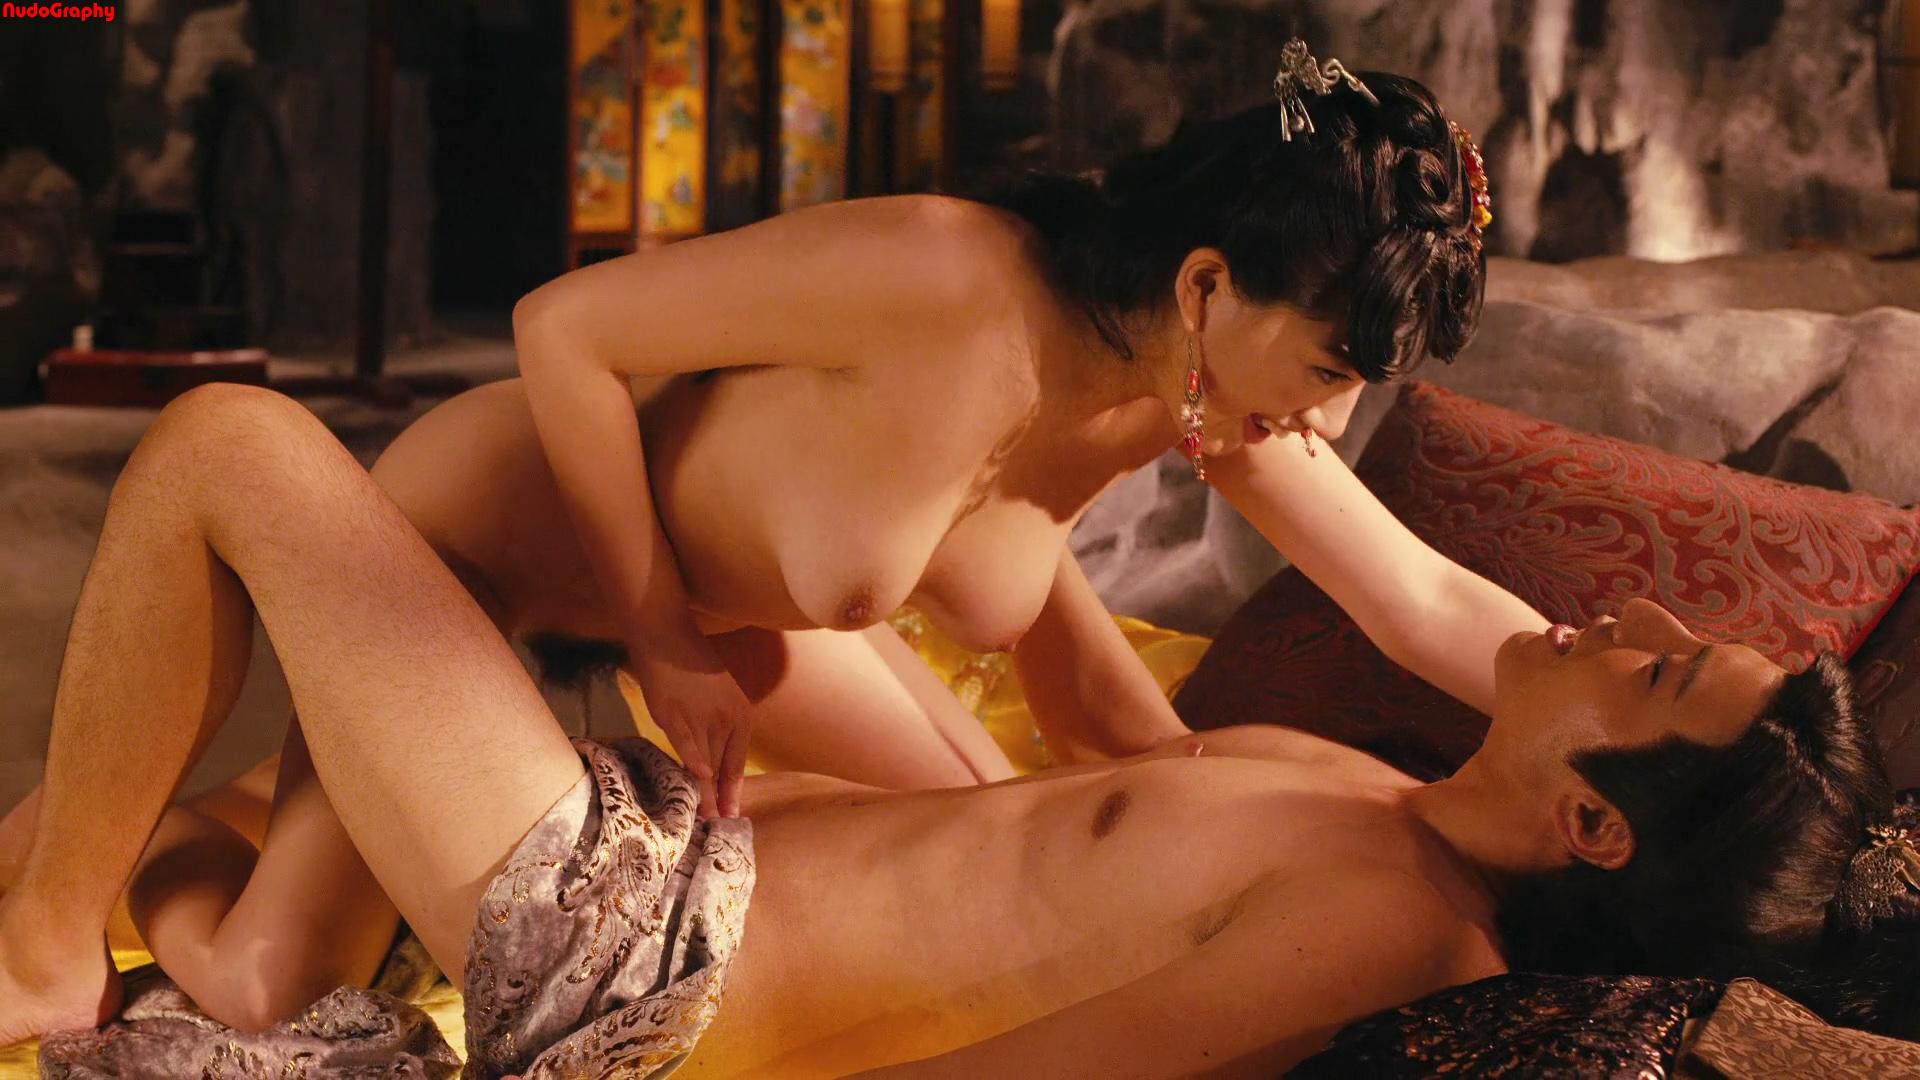 kino-kitayskiy-seks-porno